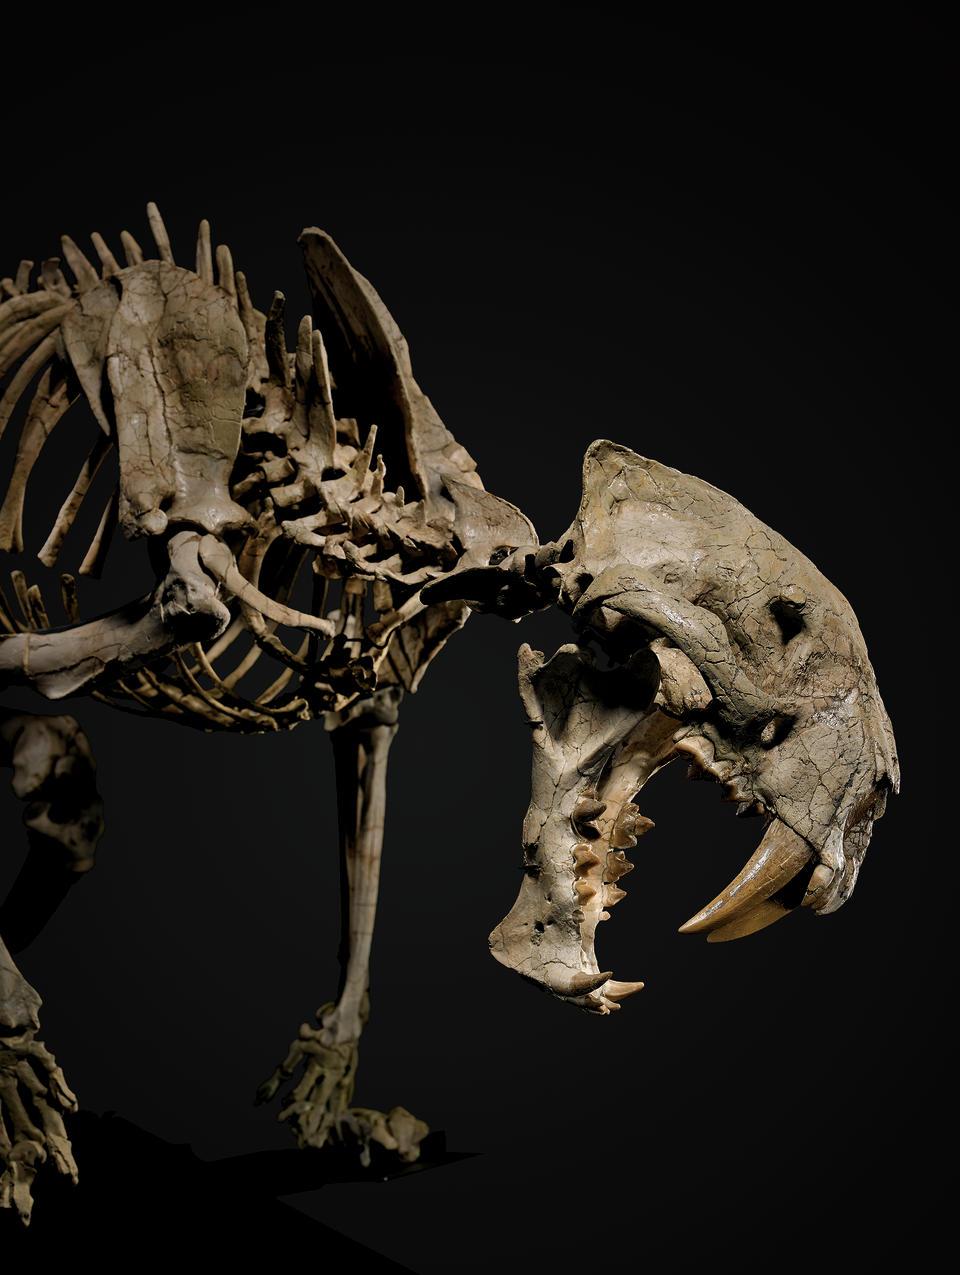 Rare Nimravid – Incomparable Mounted Skeleton